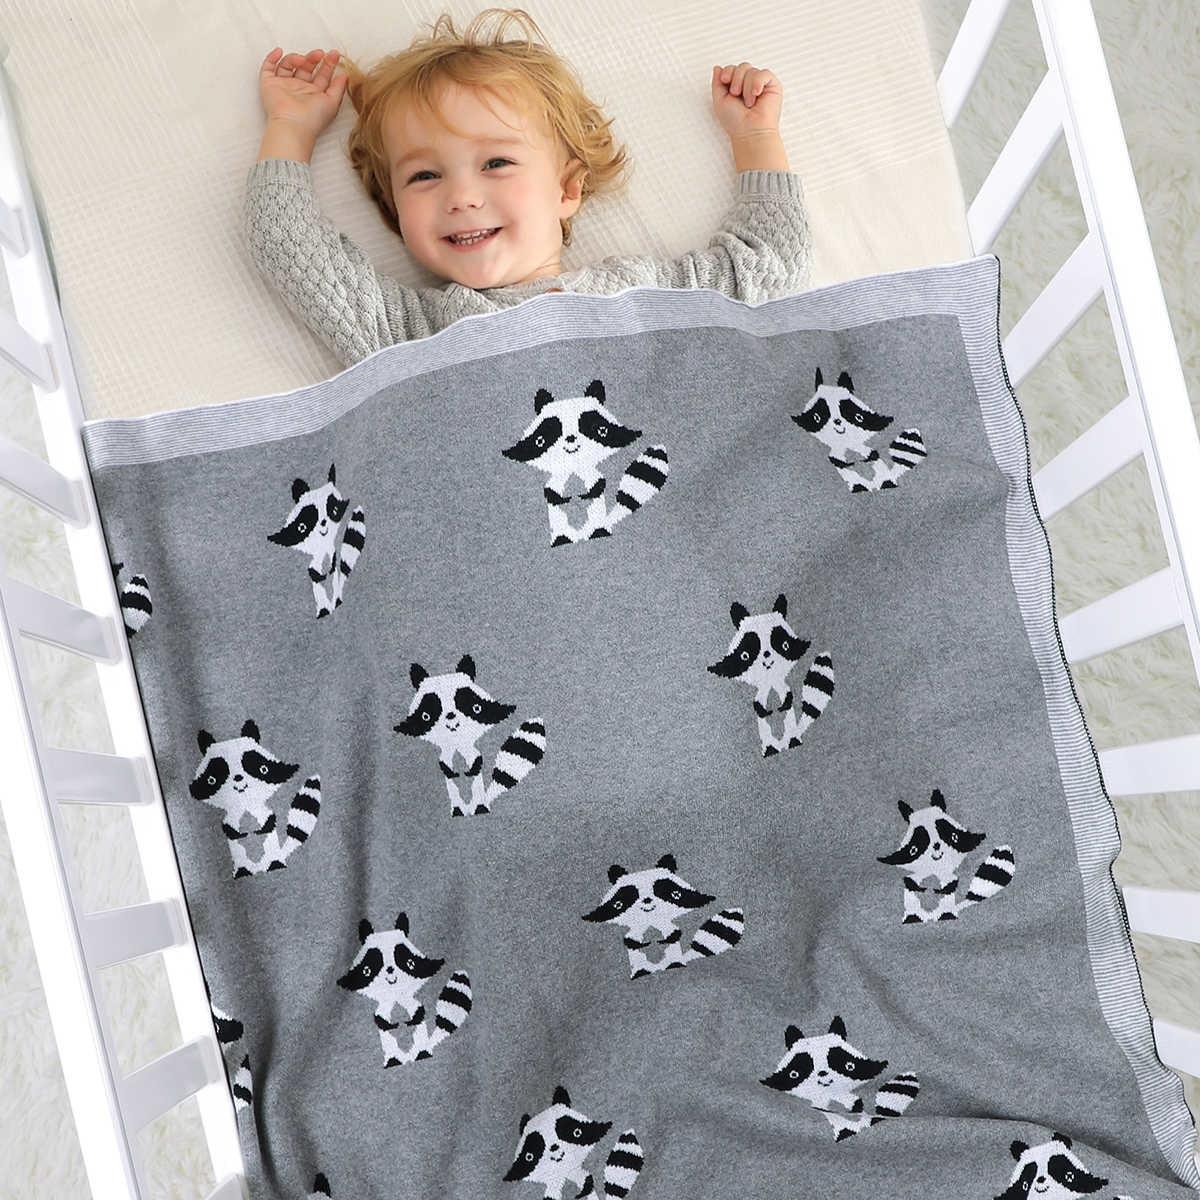 Cartoon Baby Receiving Blanket New Infant Kids Swaddle Wrap Blanket Sleeping Warm Quilt Bed Cover Blanket